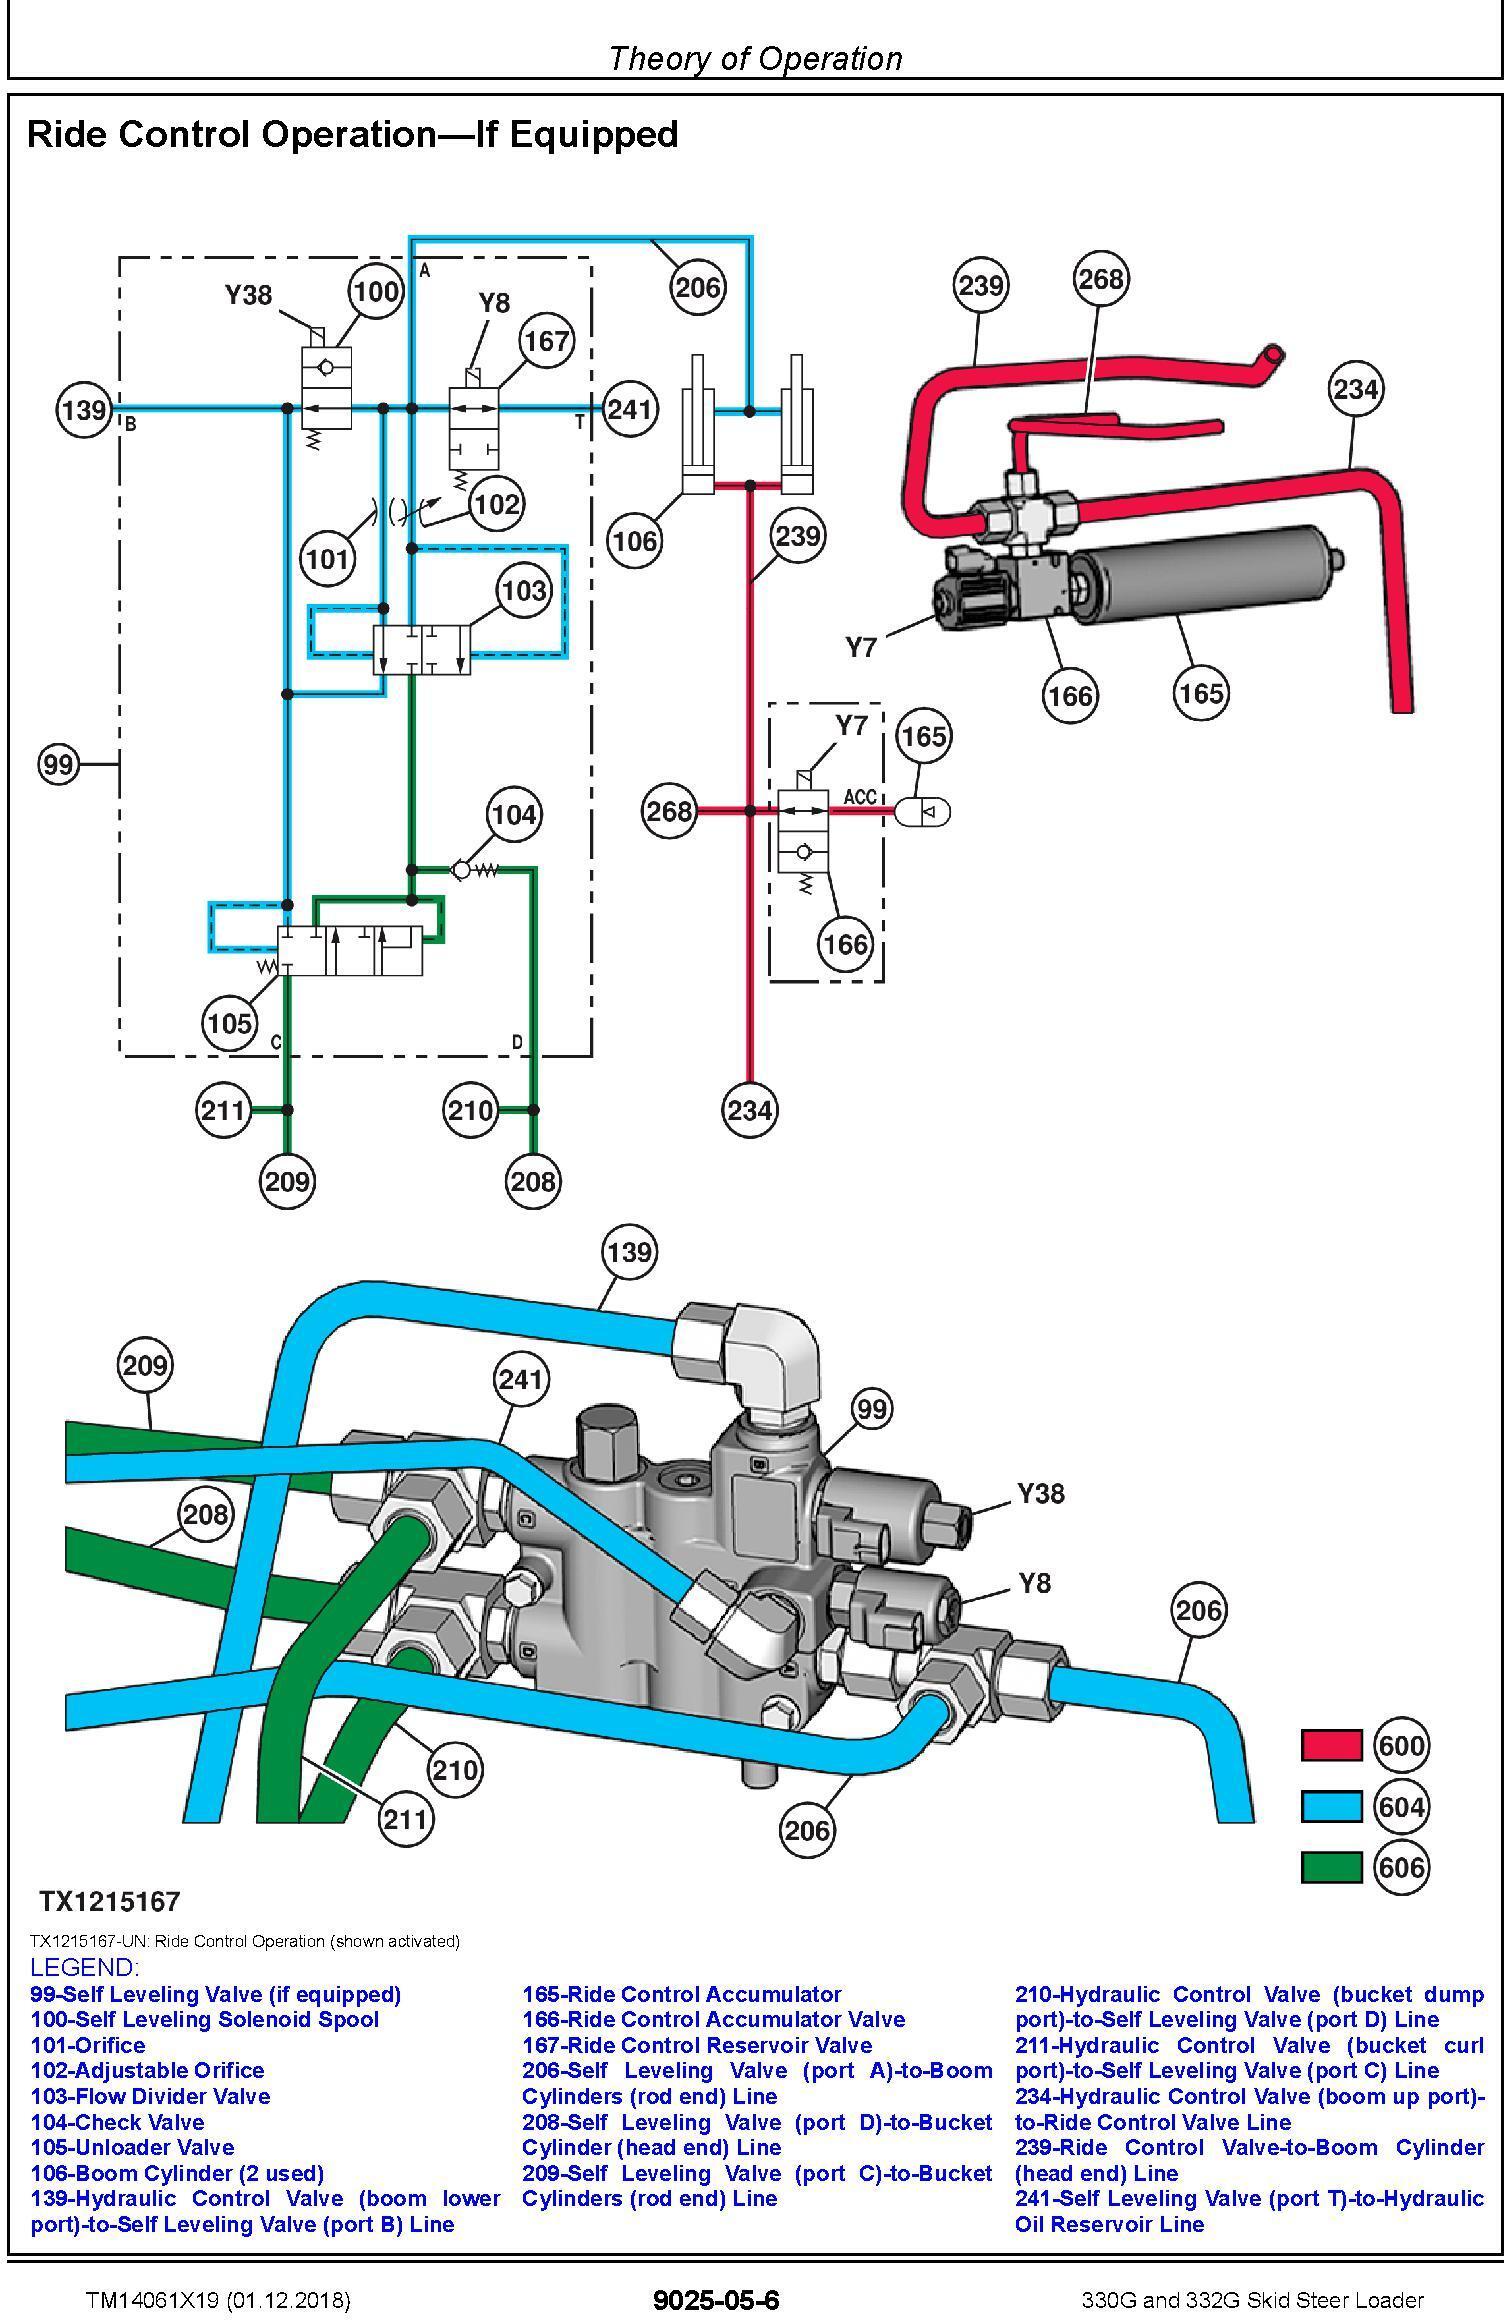 John Deere 330G and 332G Skid Steer Loader Operation & Test Technical Service Manual (TM14061X19) - 2